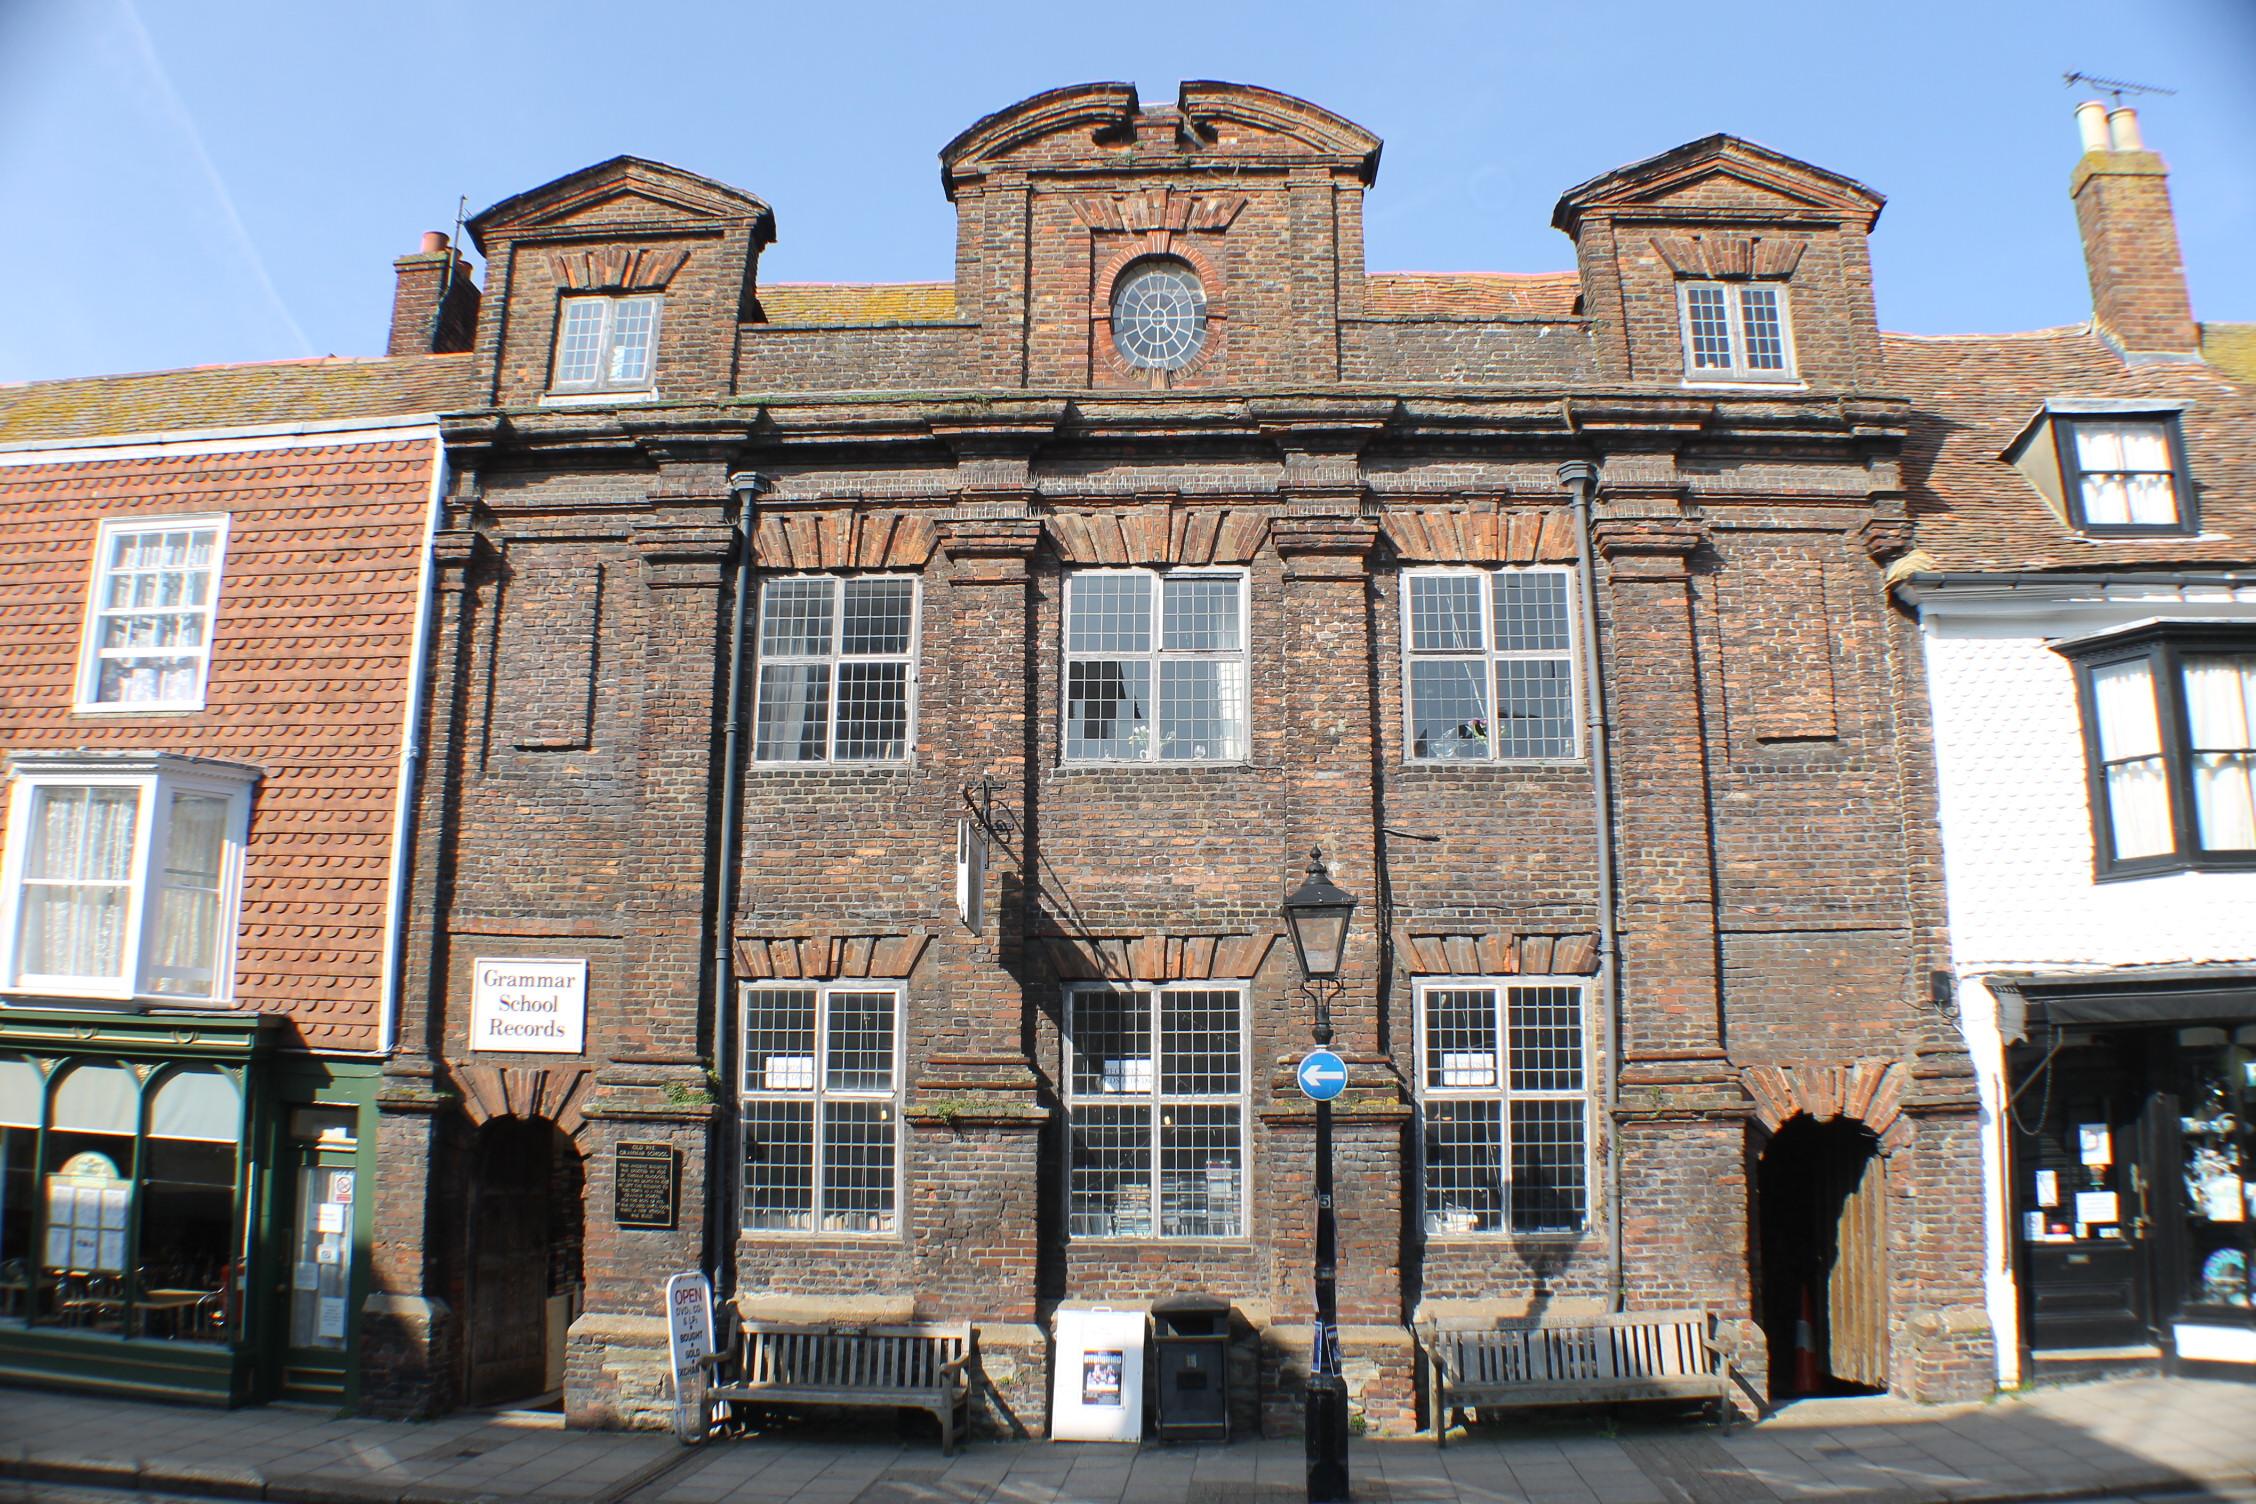 Flat 1, The Old Grammar School, High Street, Rye